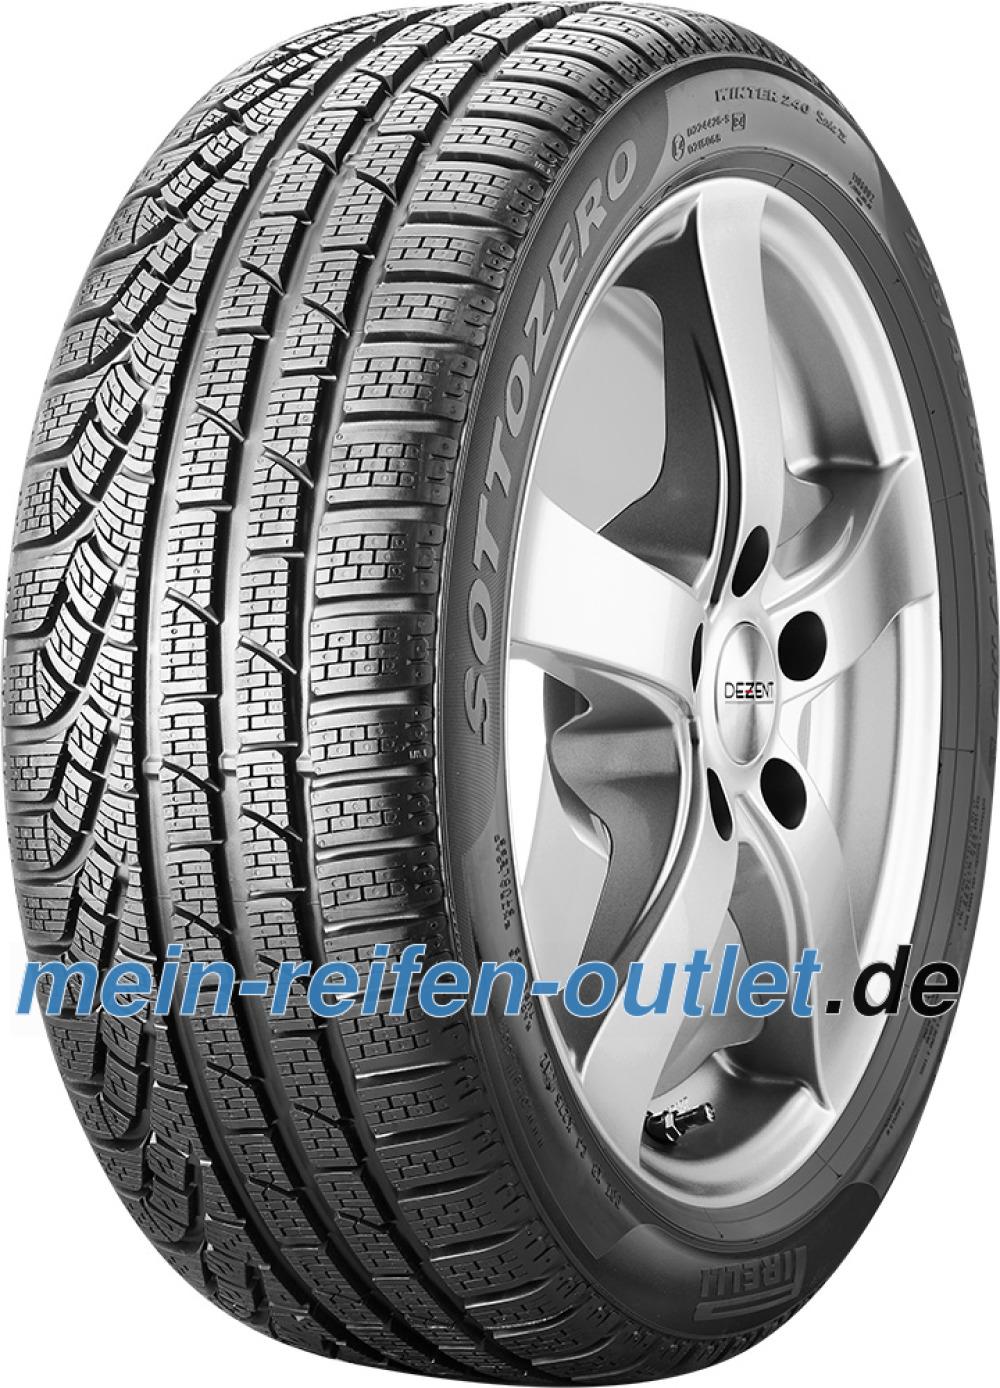 Pirelli W 240 SottoZero S2 runflat ( 225/40 R18 92V XL *, mit Felgenschutz (MFS), runflat )